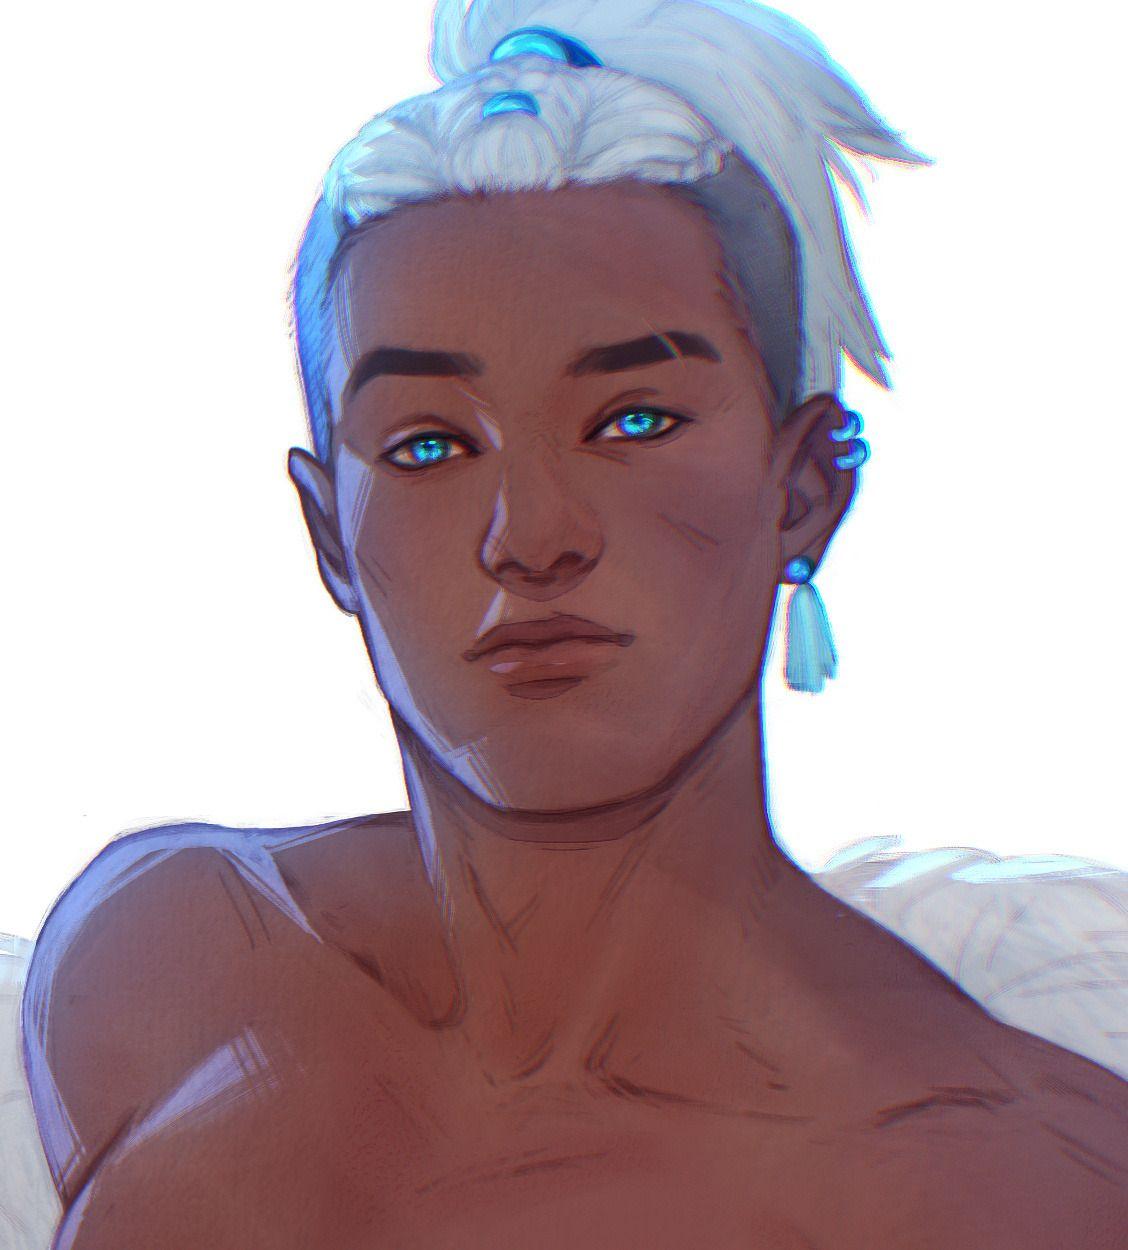 Side Account On Instagram Sokka With His Hair Down That S All Sokka Avatarthelasta In 2020 Avatar Airbender Avatar Fan Art Avatar Legend Of Aang